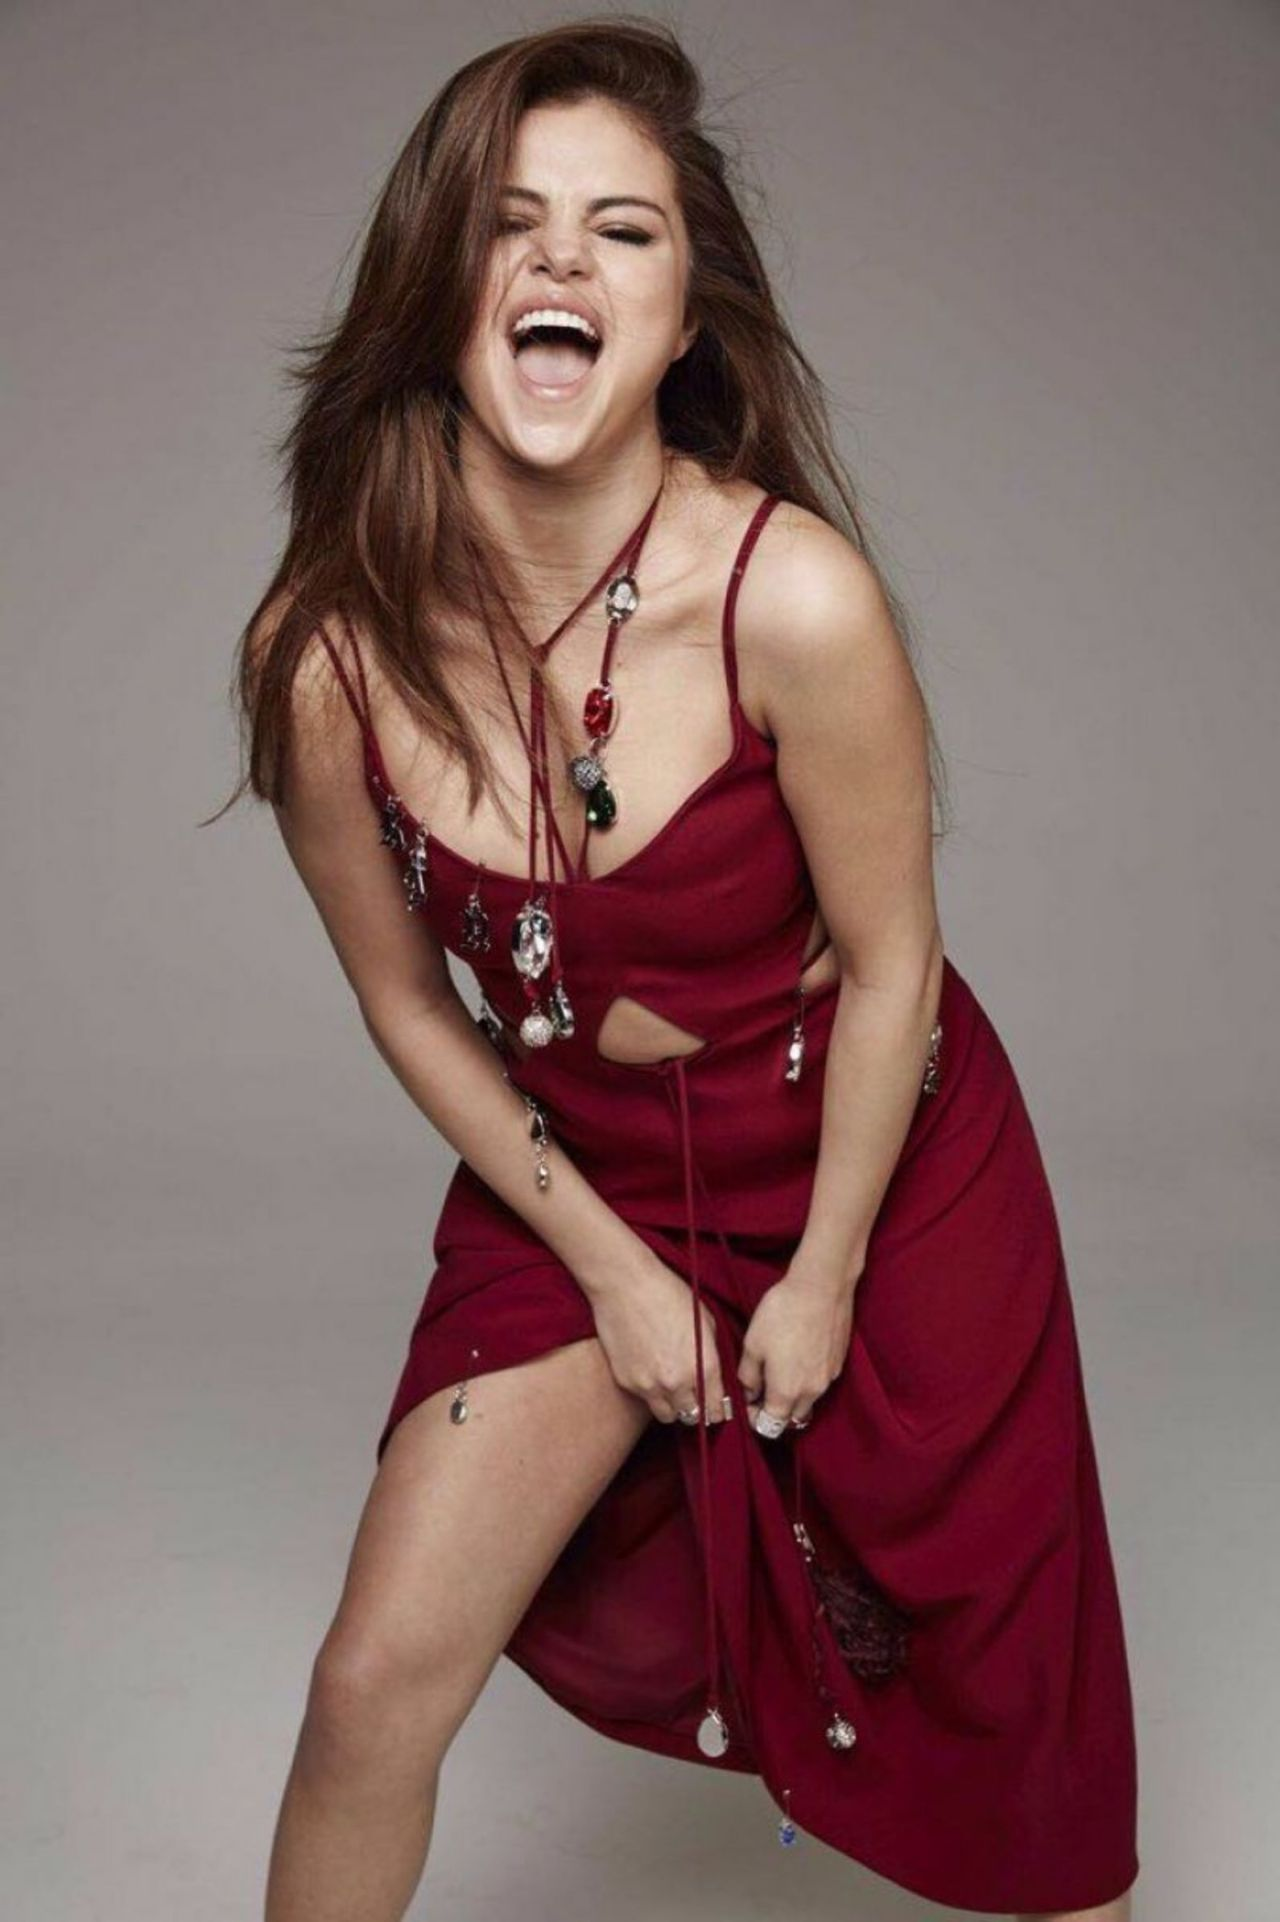 Selena Gomez - Photoshoot For Marie Claire 2016-6670